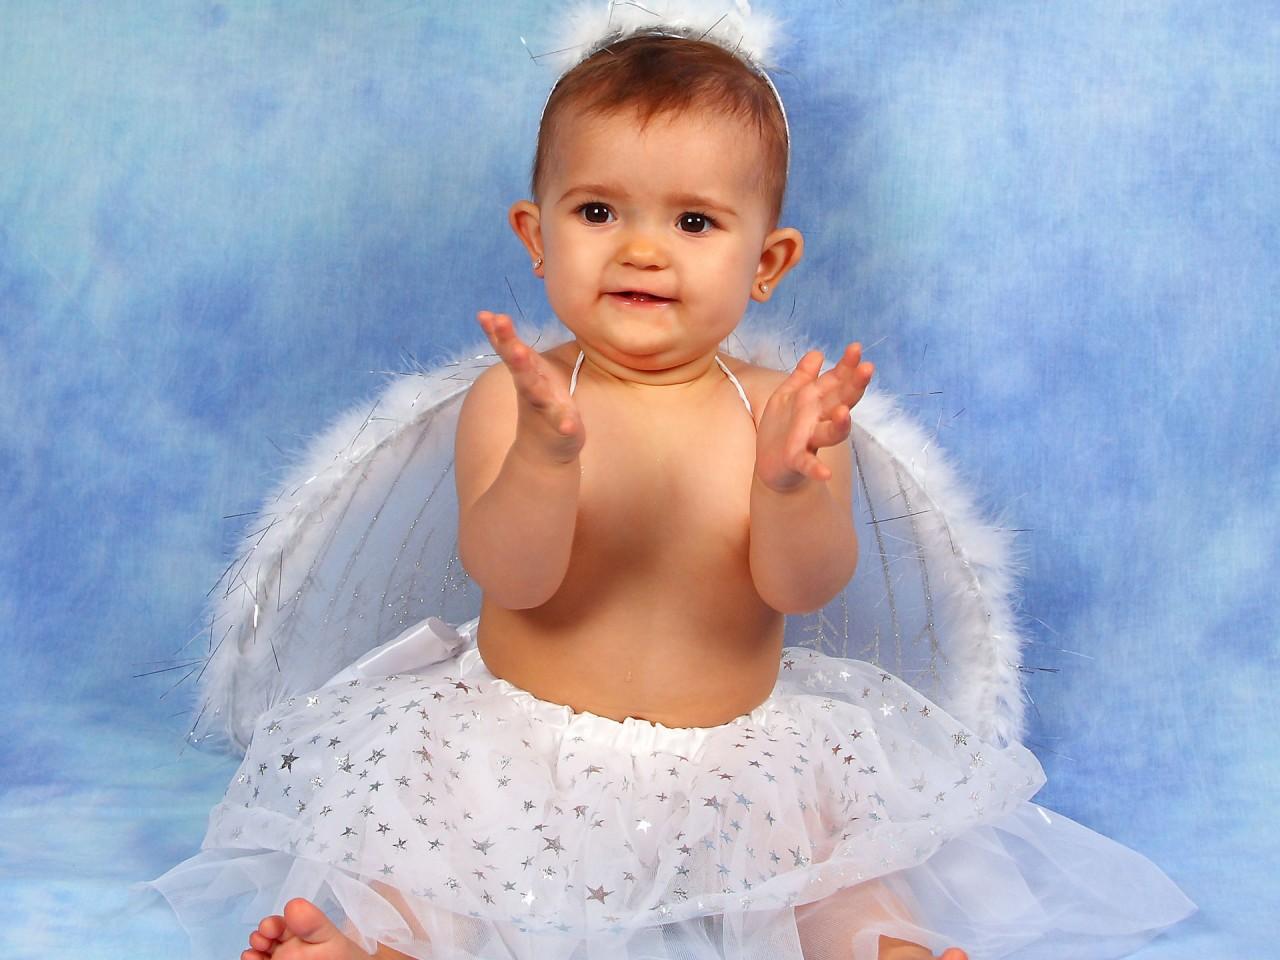 Cute Baby Angel Wallpaper Cute Angel Baby Girl Wallpapers Hd Wallpapers Id 6501